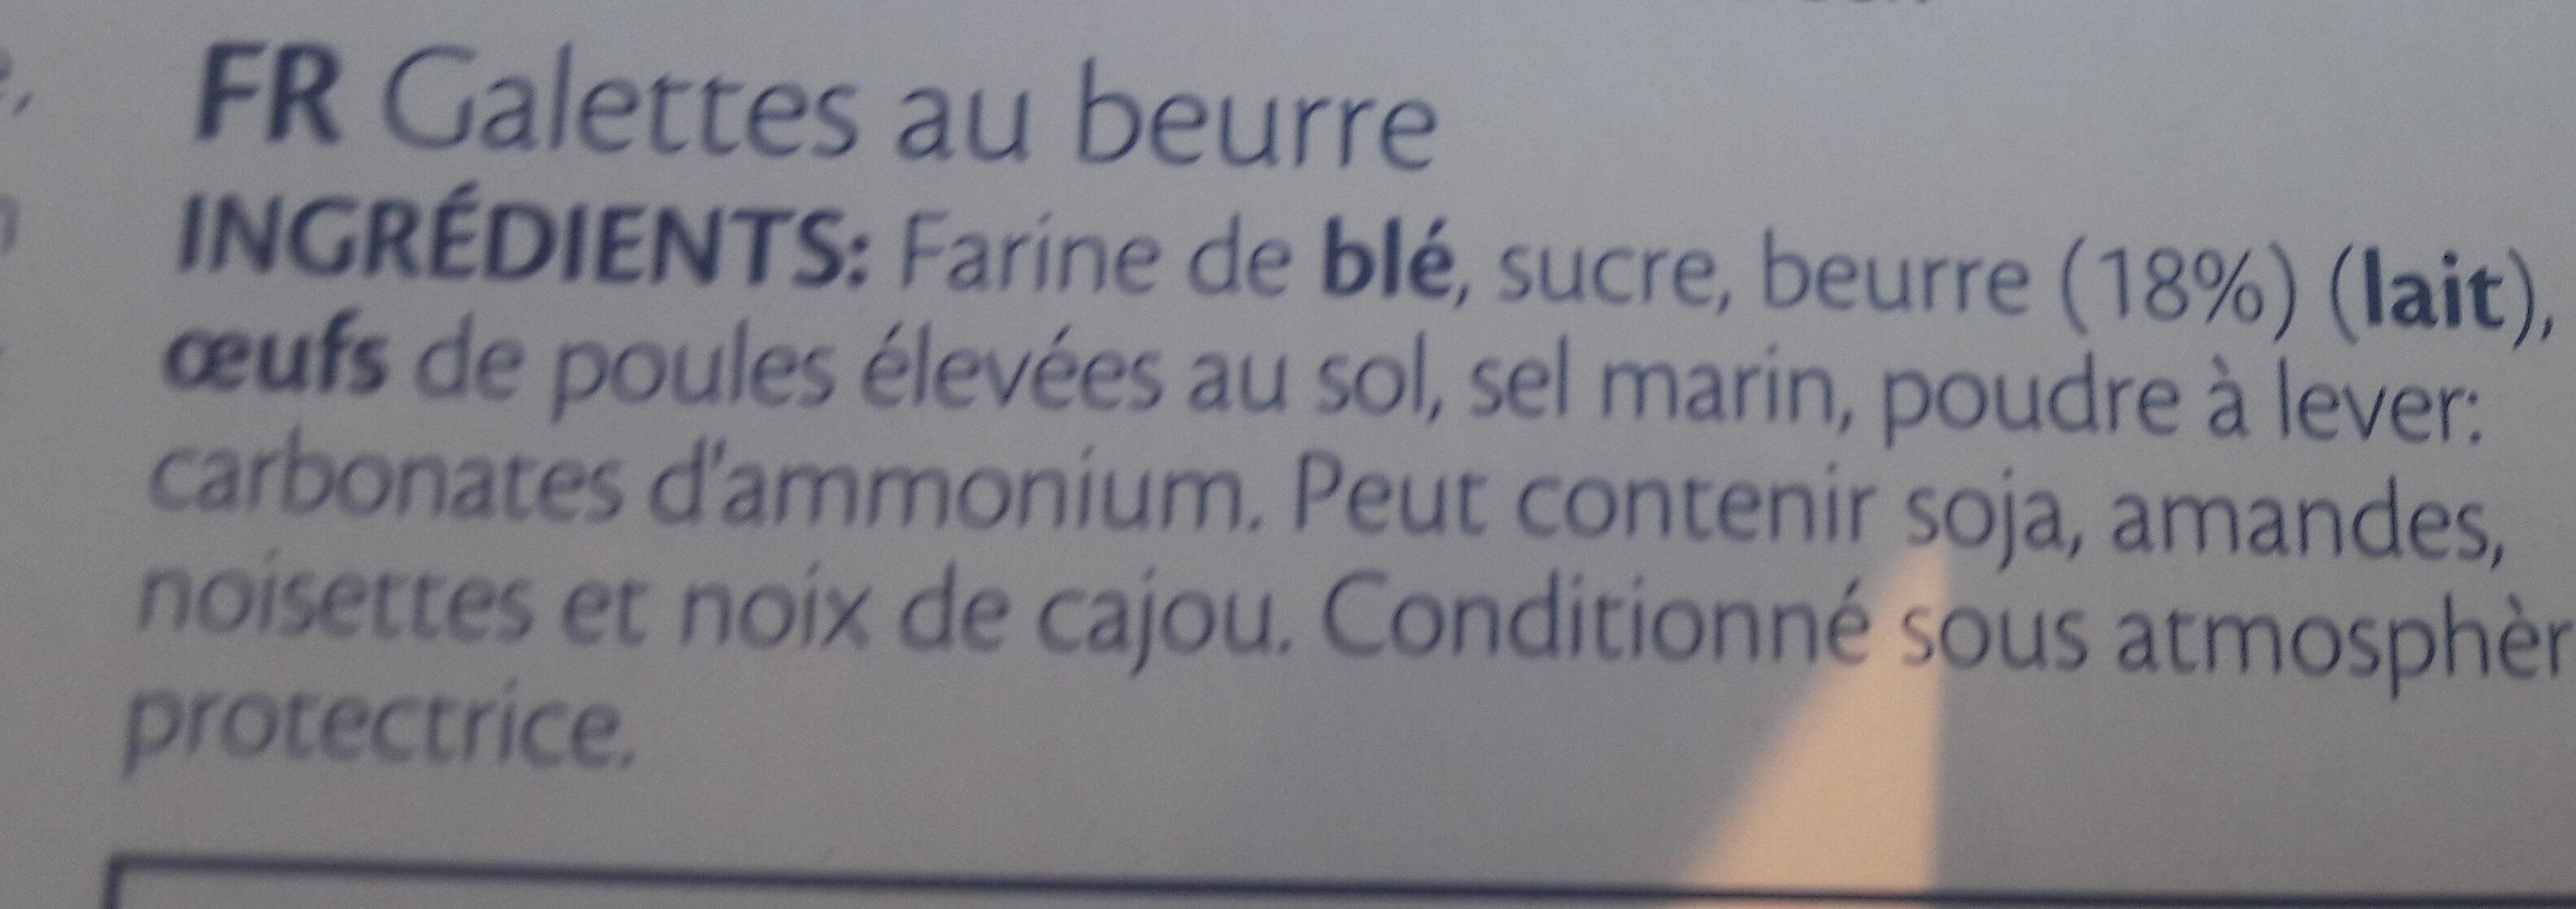 Gaufre - Ingrédients - fr